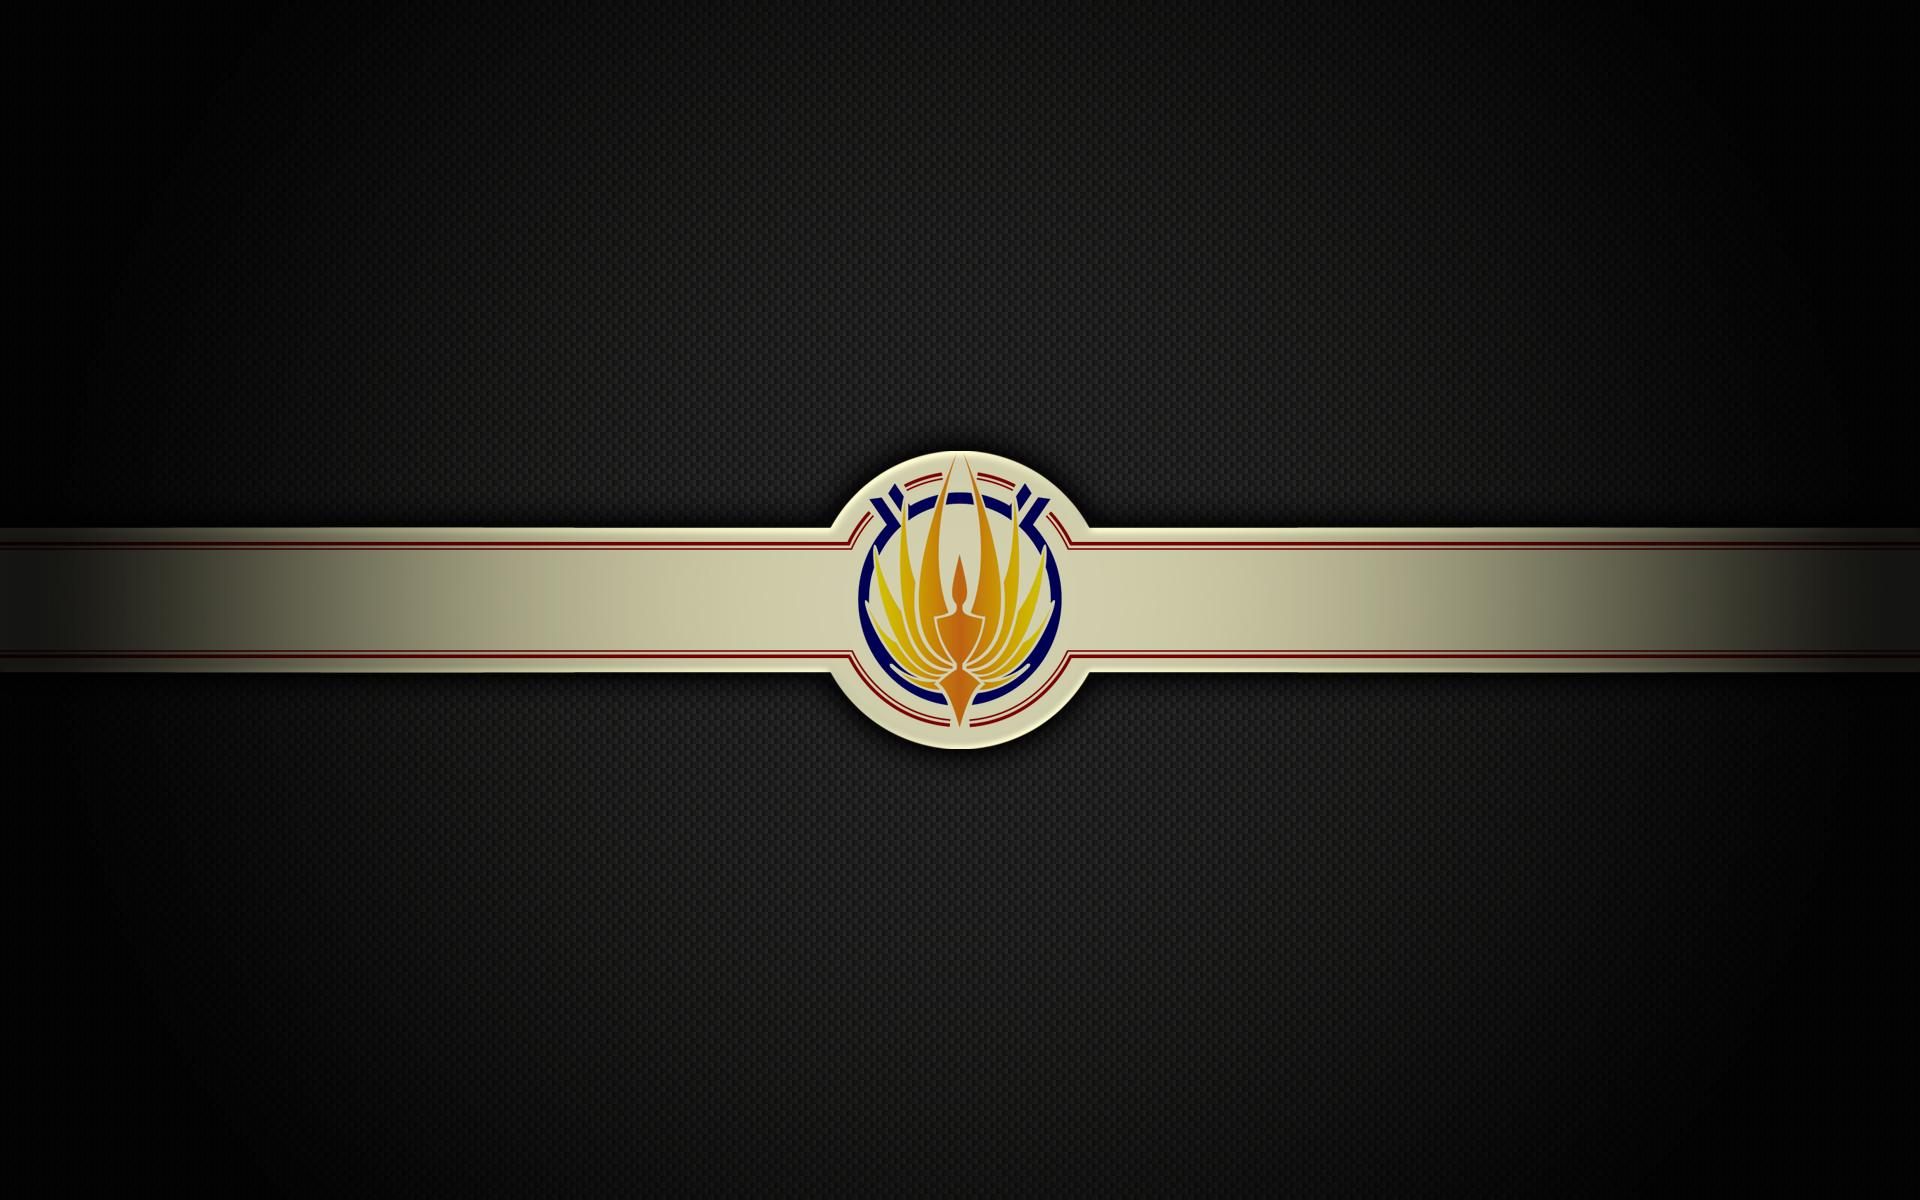 Cool Logo Backgrounds - WallpaperSafari